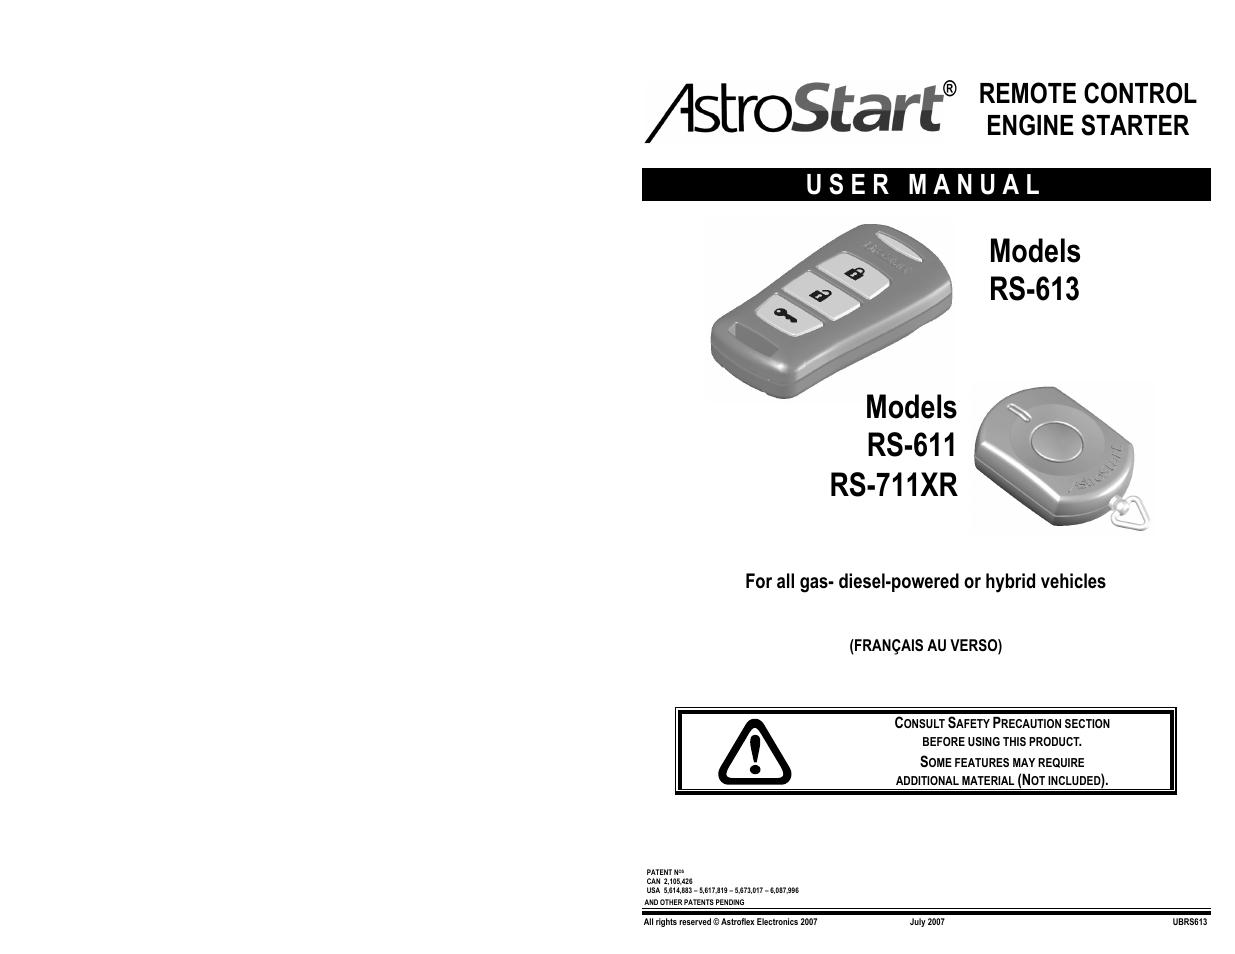 astrostart rs 611 page1?resize\=665%2C514 astrostart wiring diagram astrostart 2205a \u2022 wiring diagrams j  at virtualis.co